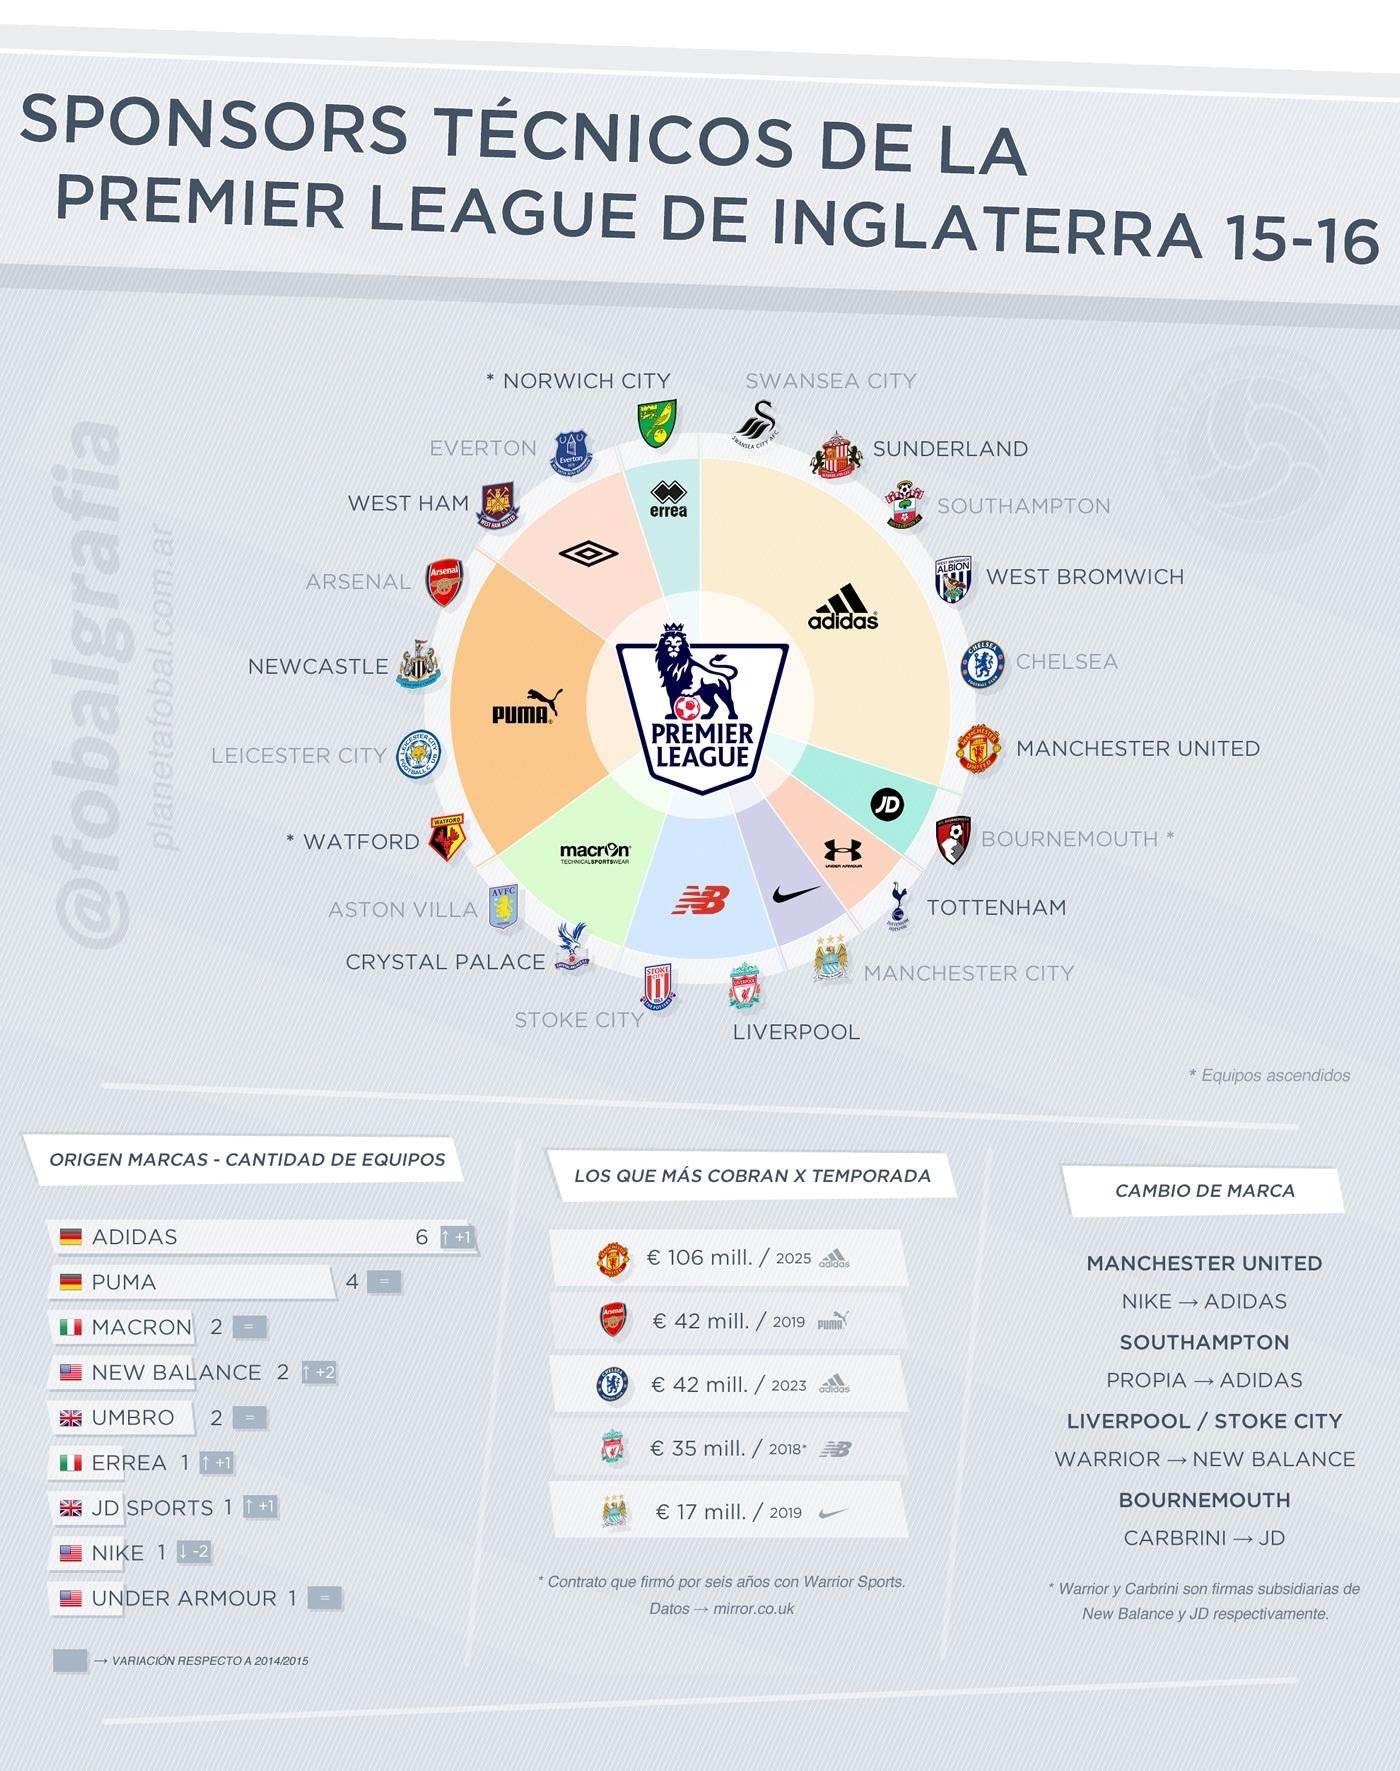 Las marcas de la Premier League